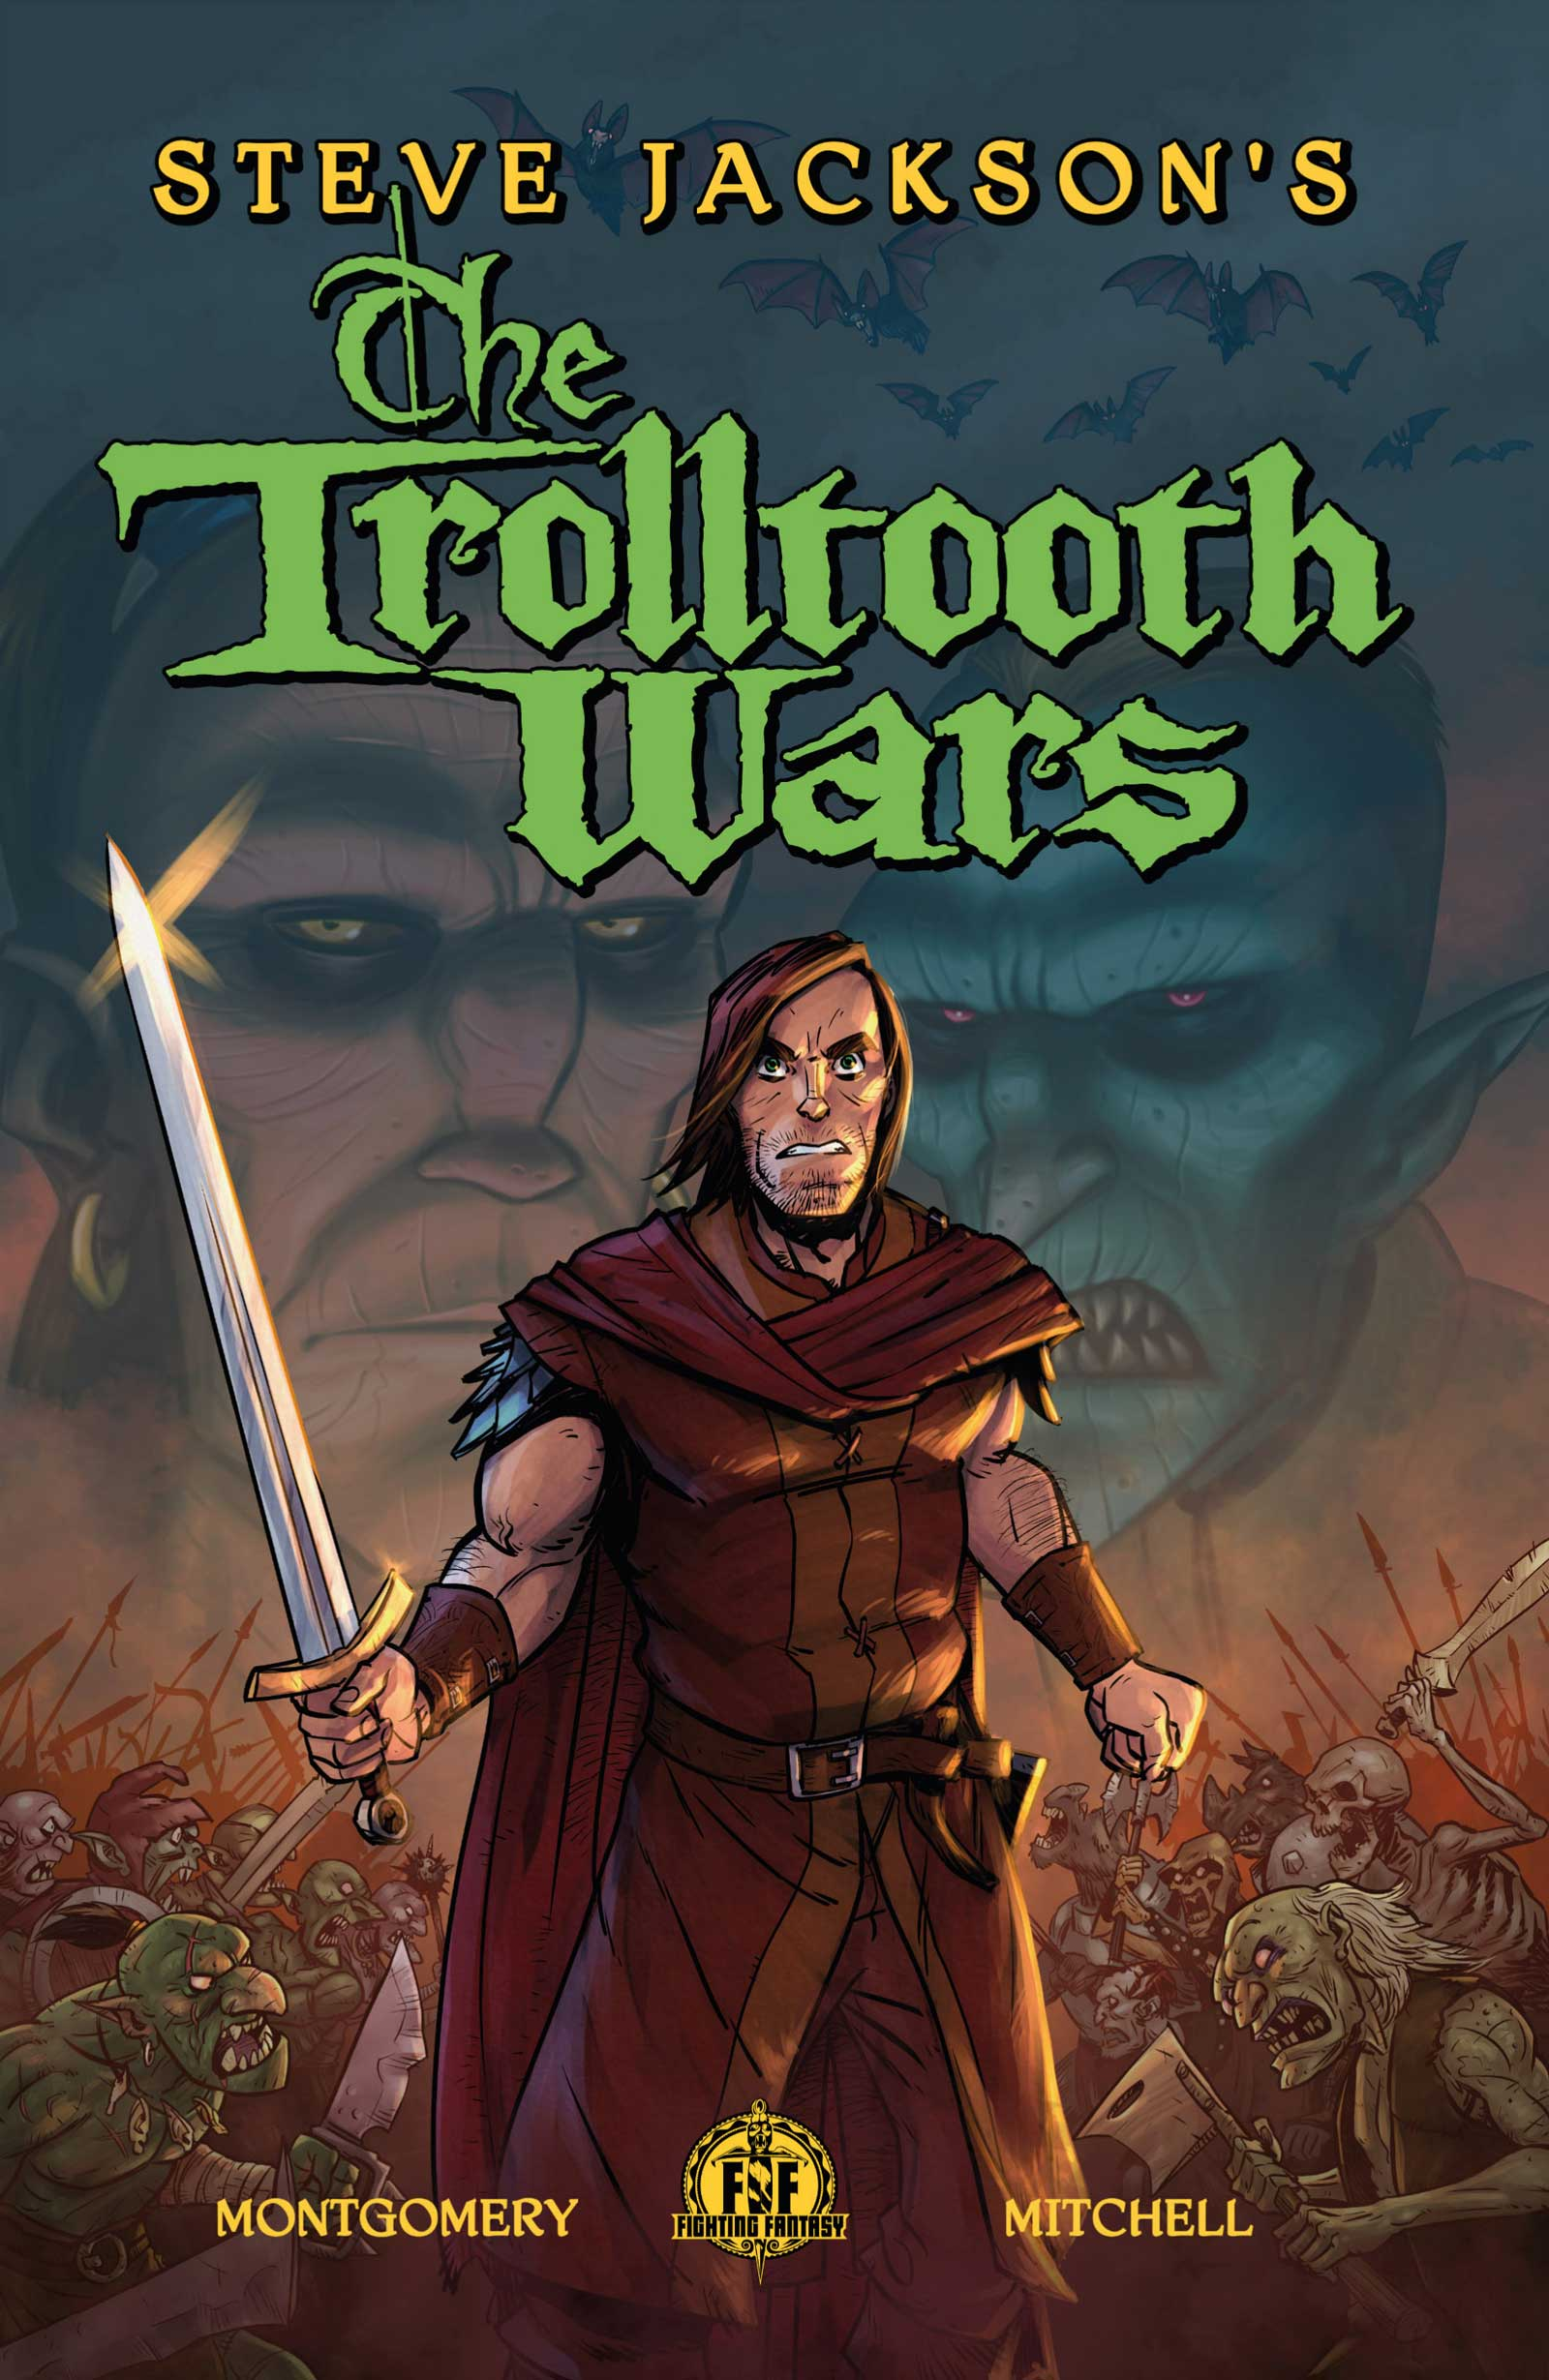 Steve Jackson's The Trolltooth Wars - Cover